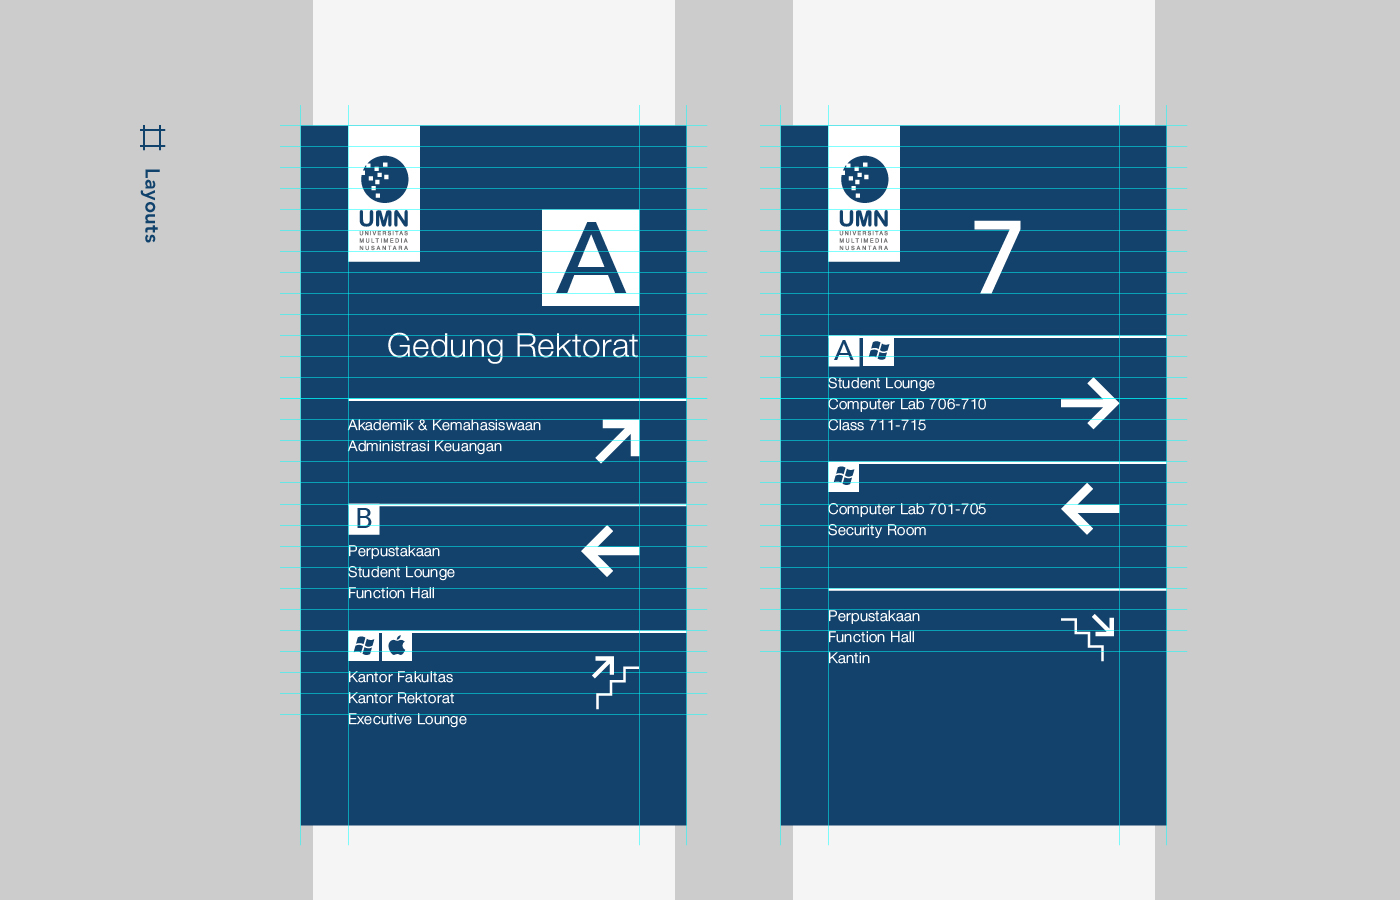 universitas multimedia nusantara UMN wayfinding Way Finding Signage sign system University minimalist Wall Mounted avenir